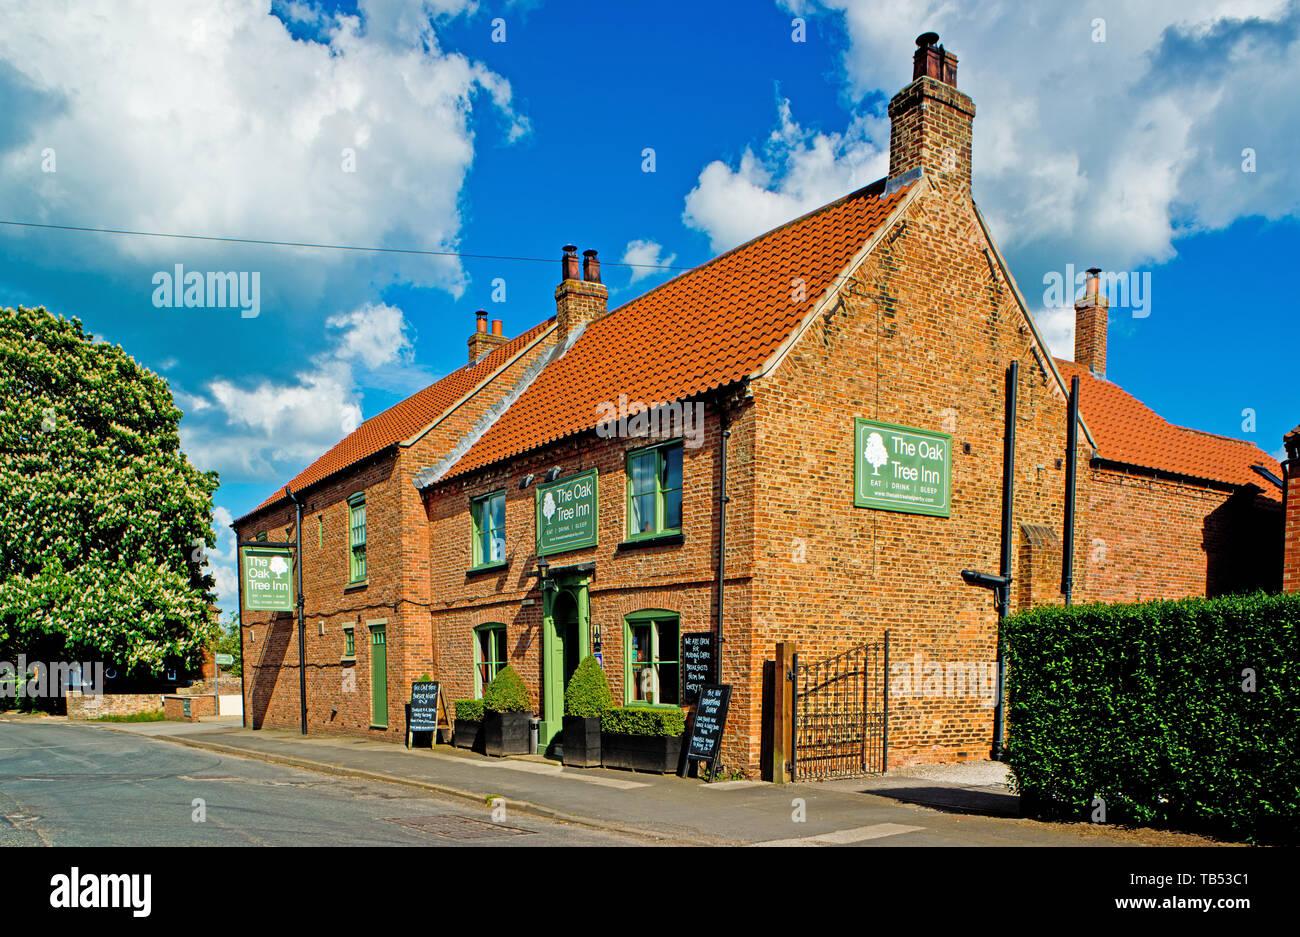 The Oak Tree Inn, Brafferton, North Yorkshire, England Stock Photo